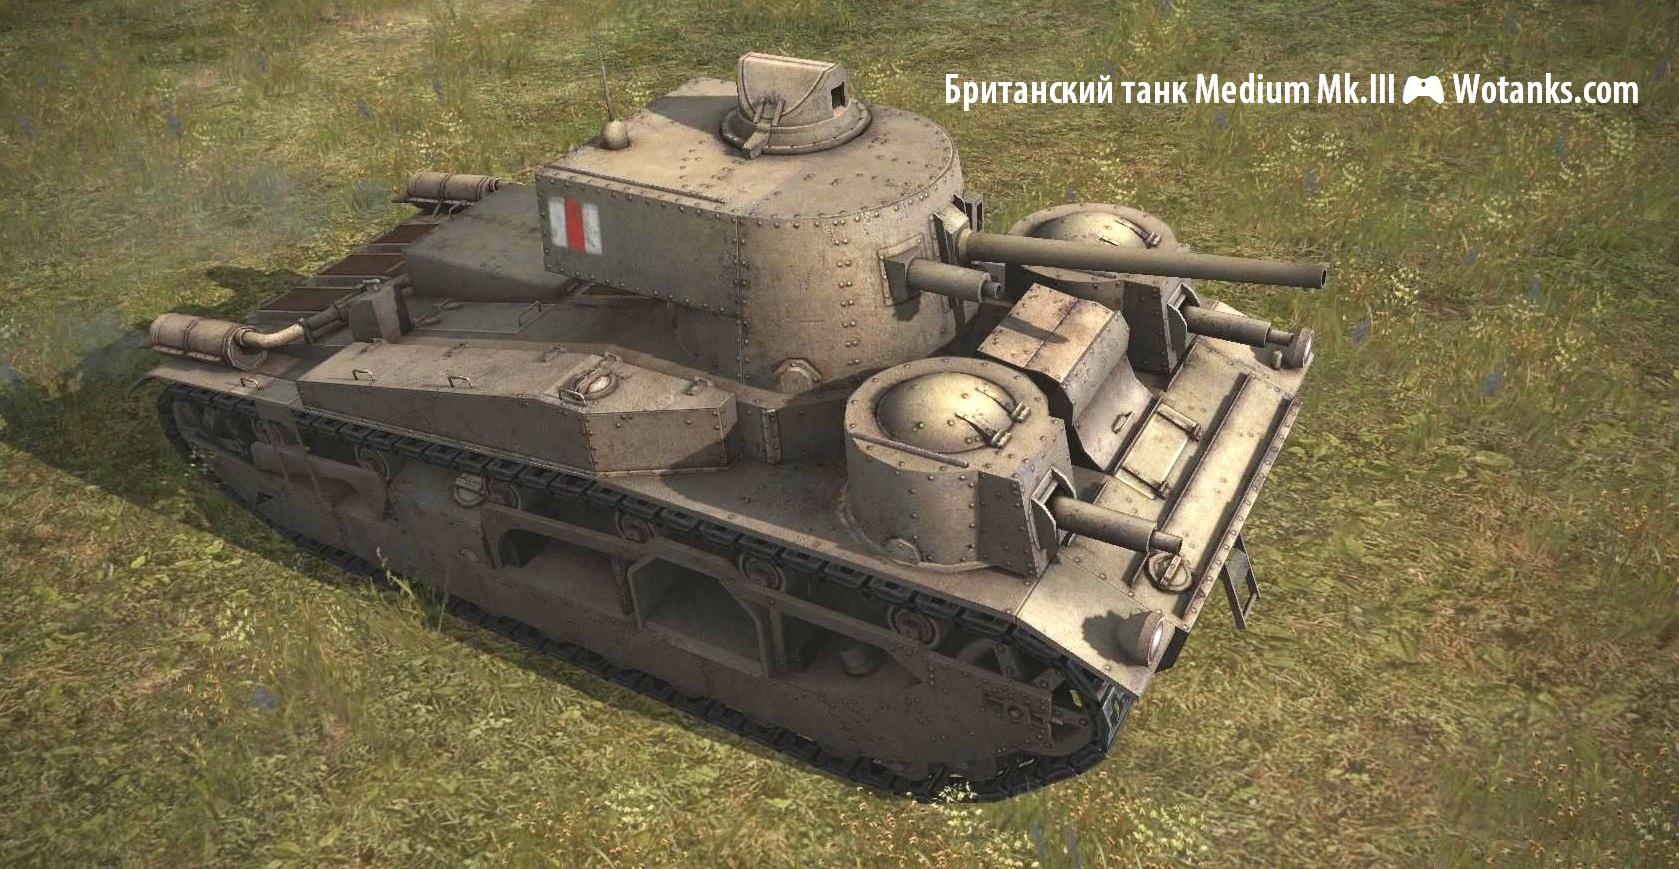 Британский танк Medium Mark III